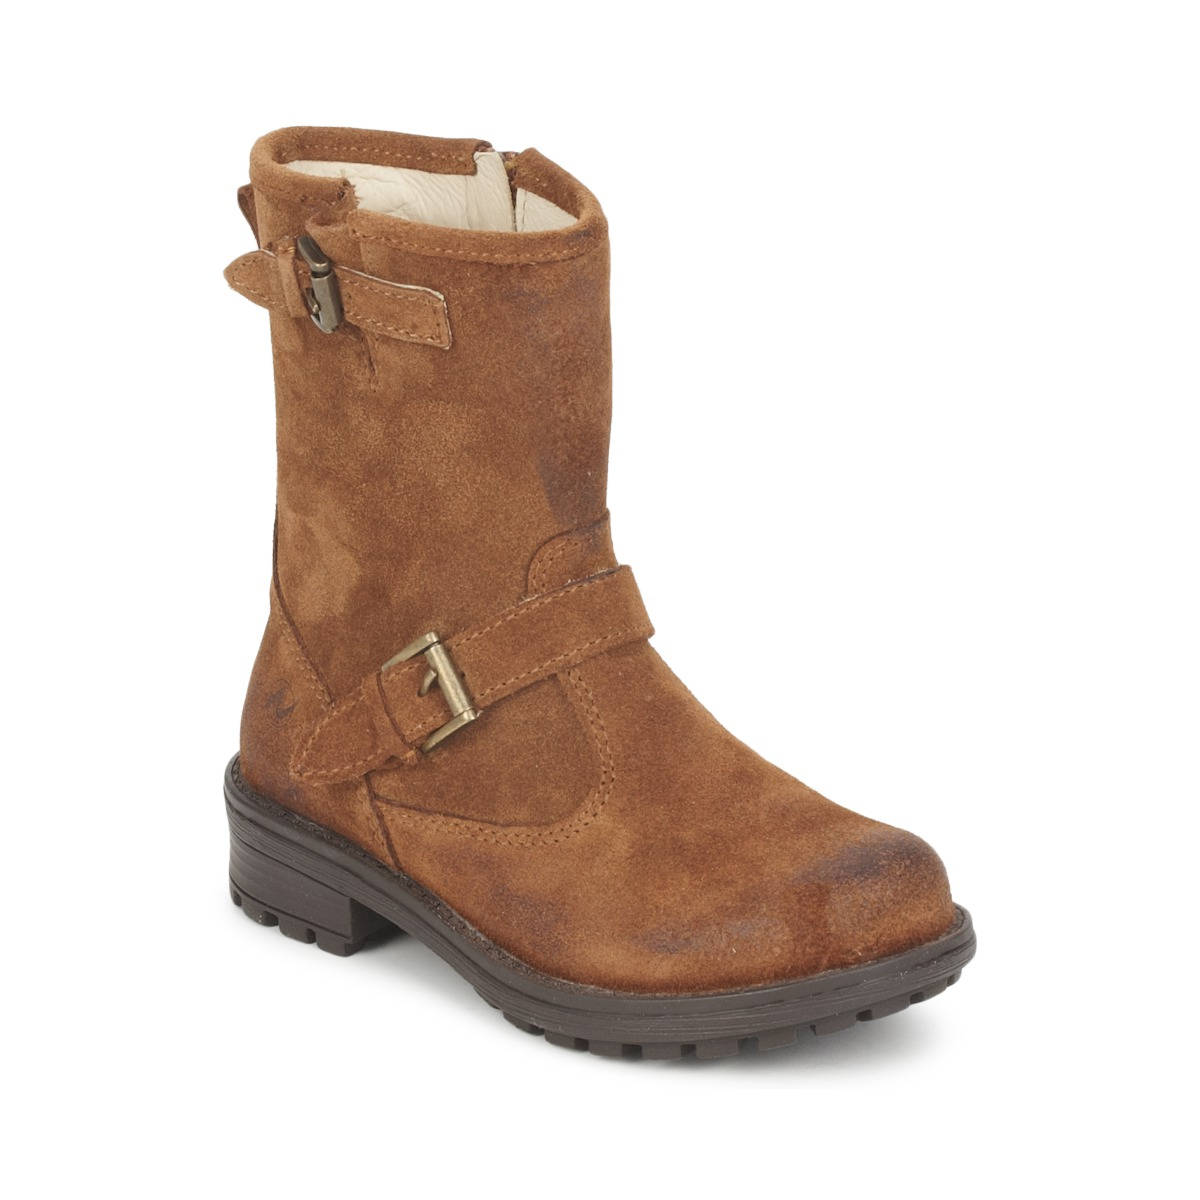 Støvler til børn Naturino  -